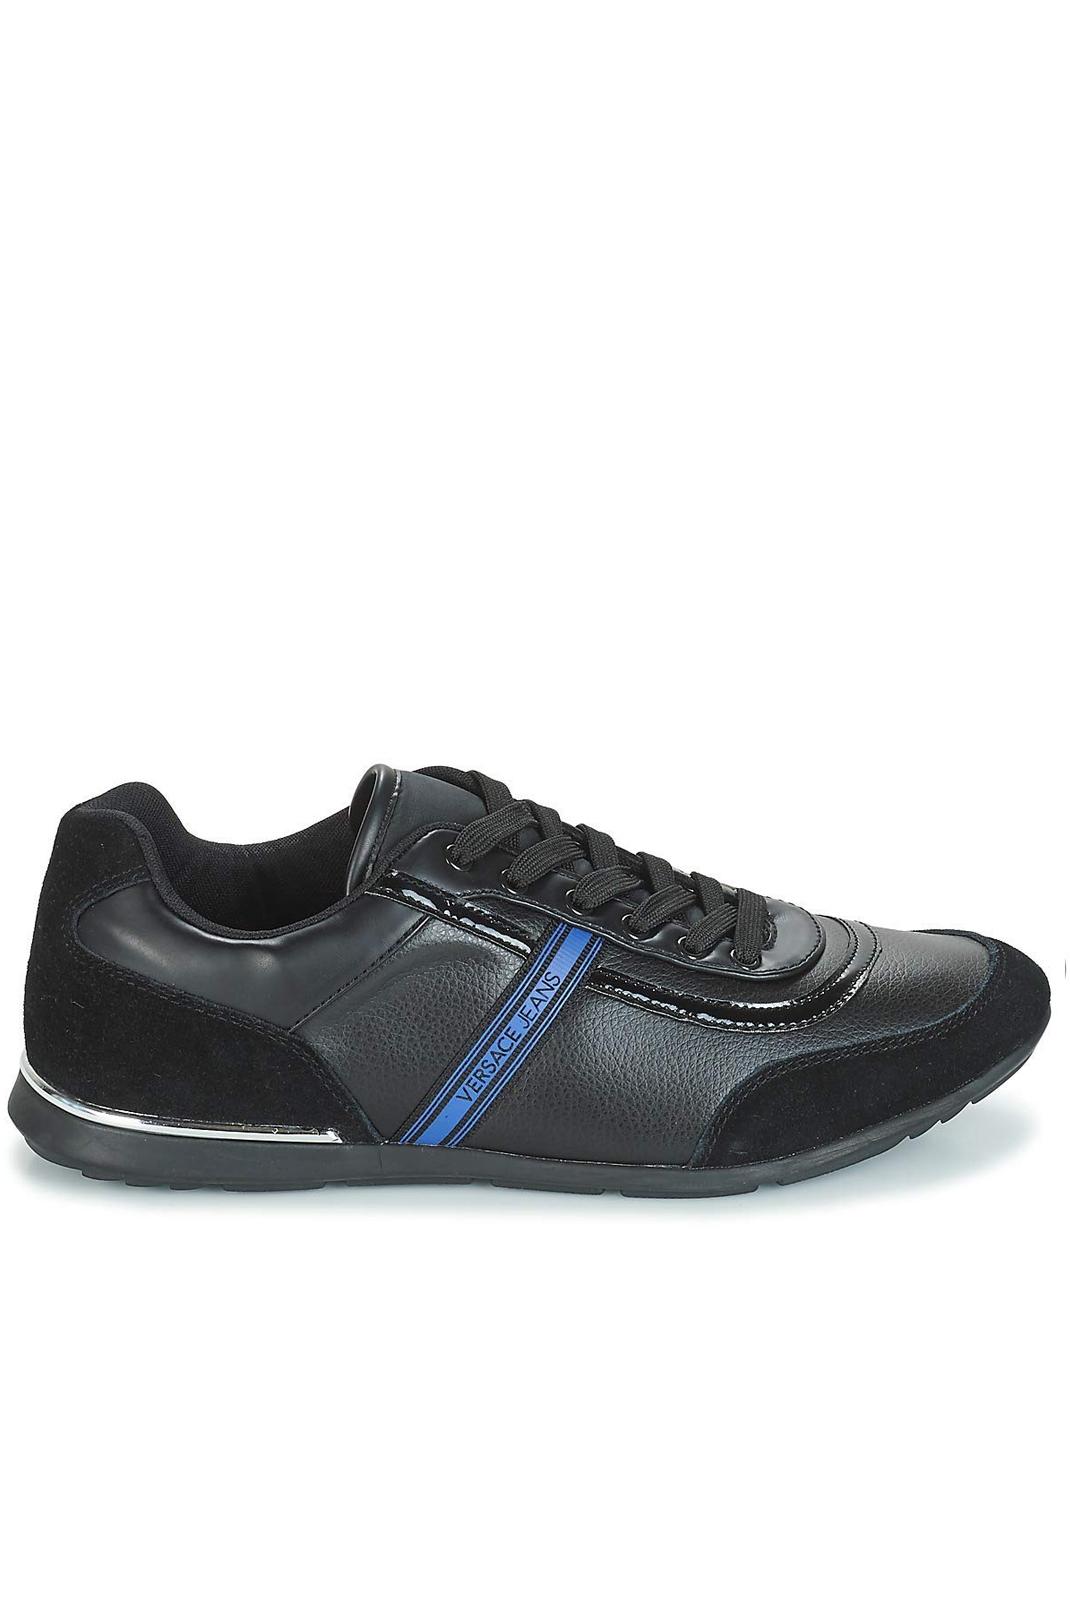 Baskets / Sport  Versace Jeans YSBSB3 899 black